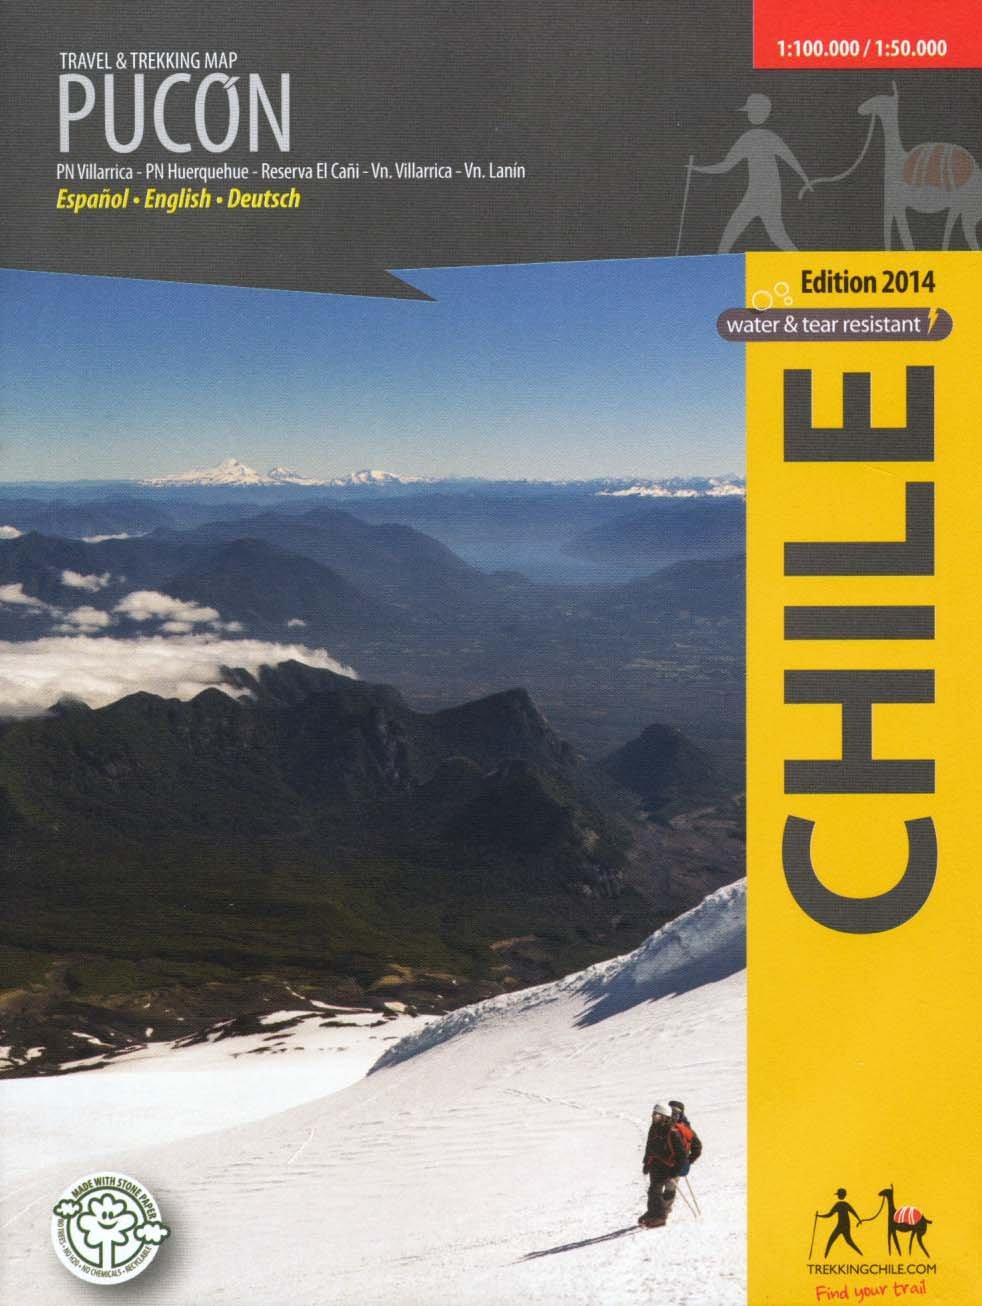 Pucón (Chile) 1:100,000 & Huerquehue NP 1:50,000 Trekking Map, waterproof, GPS-compatible COMPASS ebook